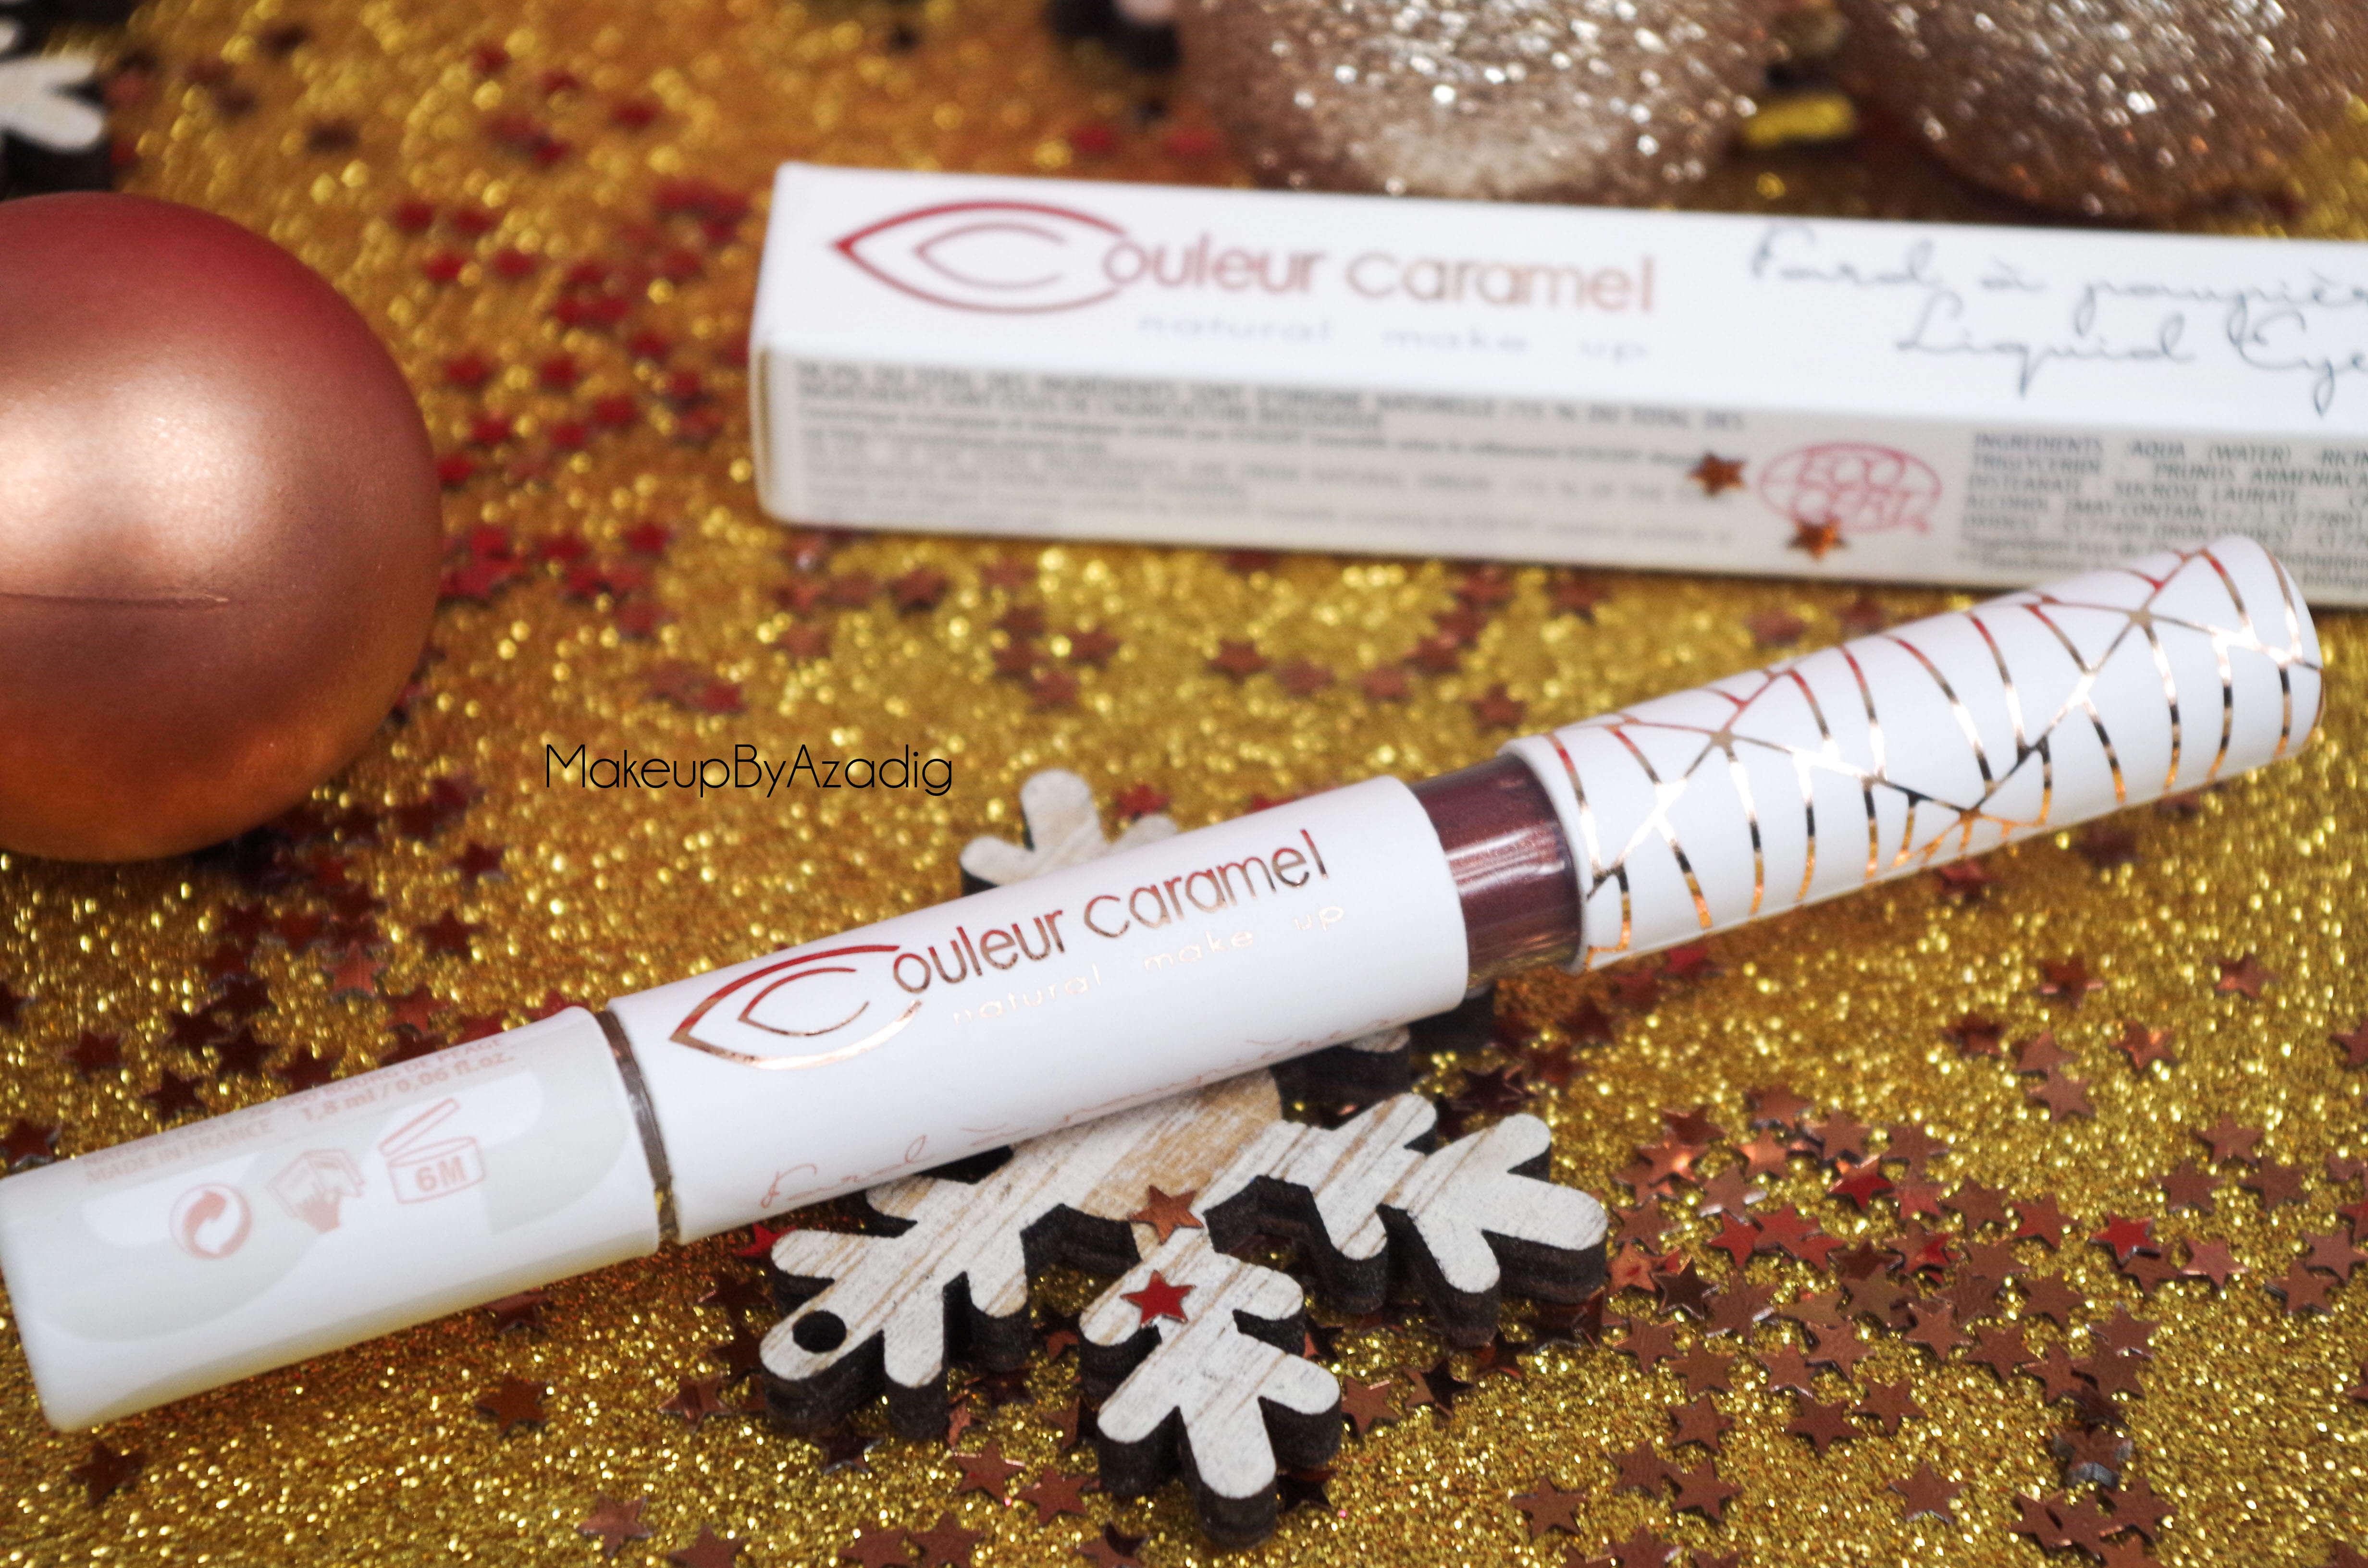 biotyfull-box-beaute-makeupbyazadig-revue-avis-prix-troyes-paris-produits-bio-makeup